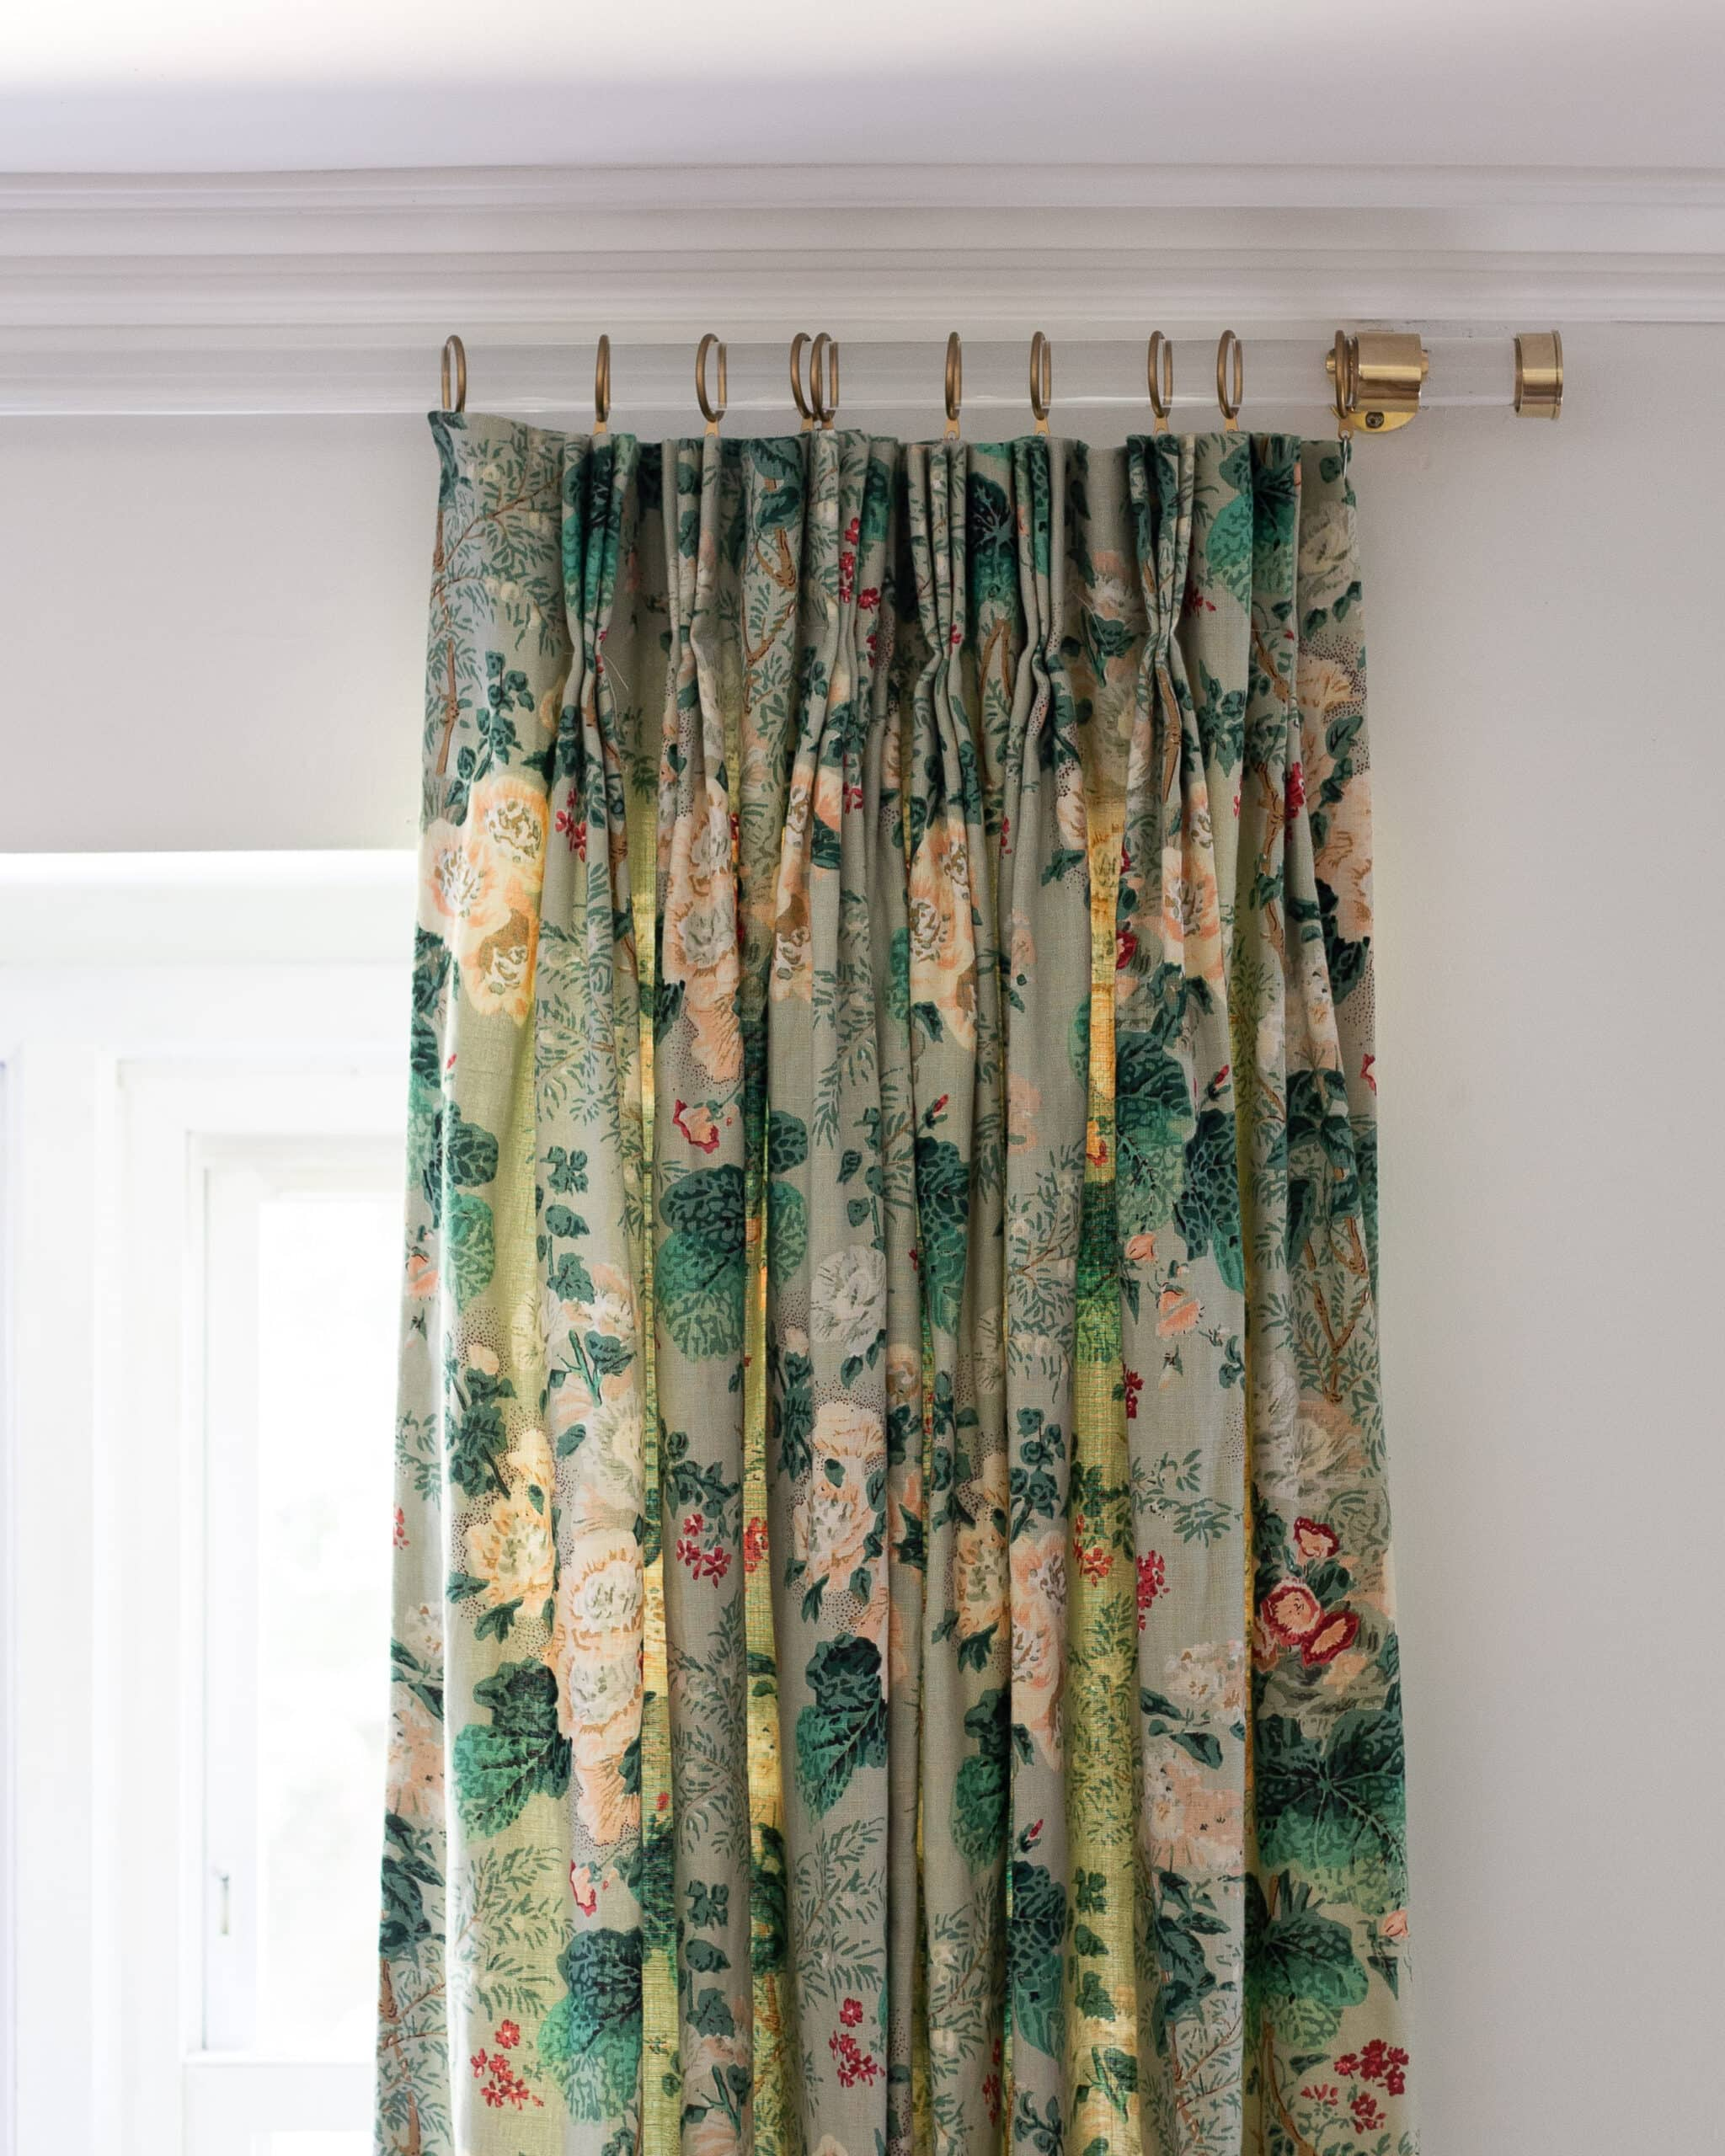 lucite-curtain-rod-custom-lee-jofa-drapes-brass-hardware